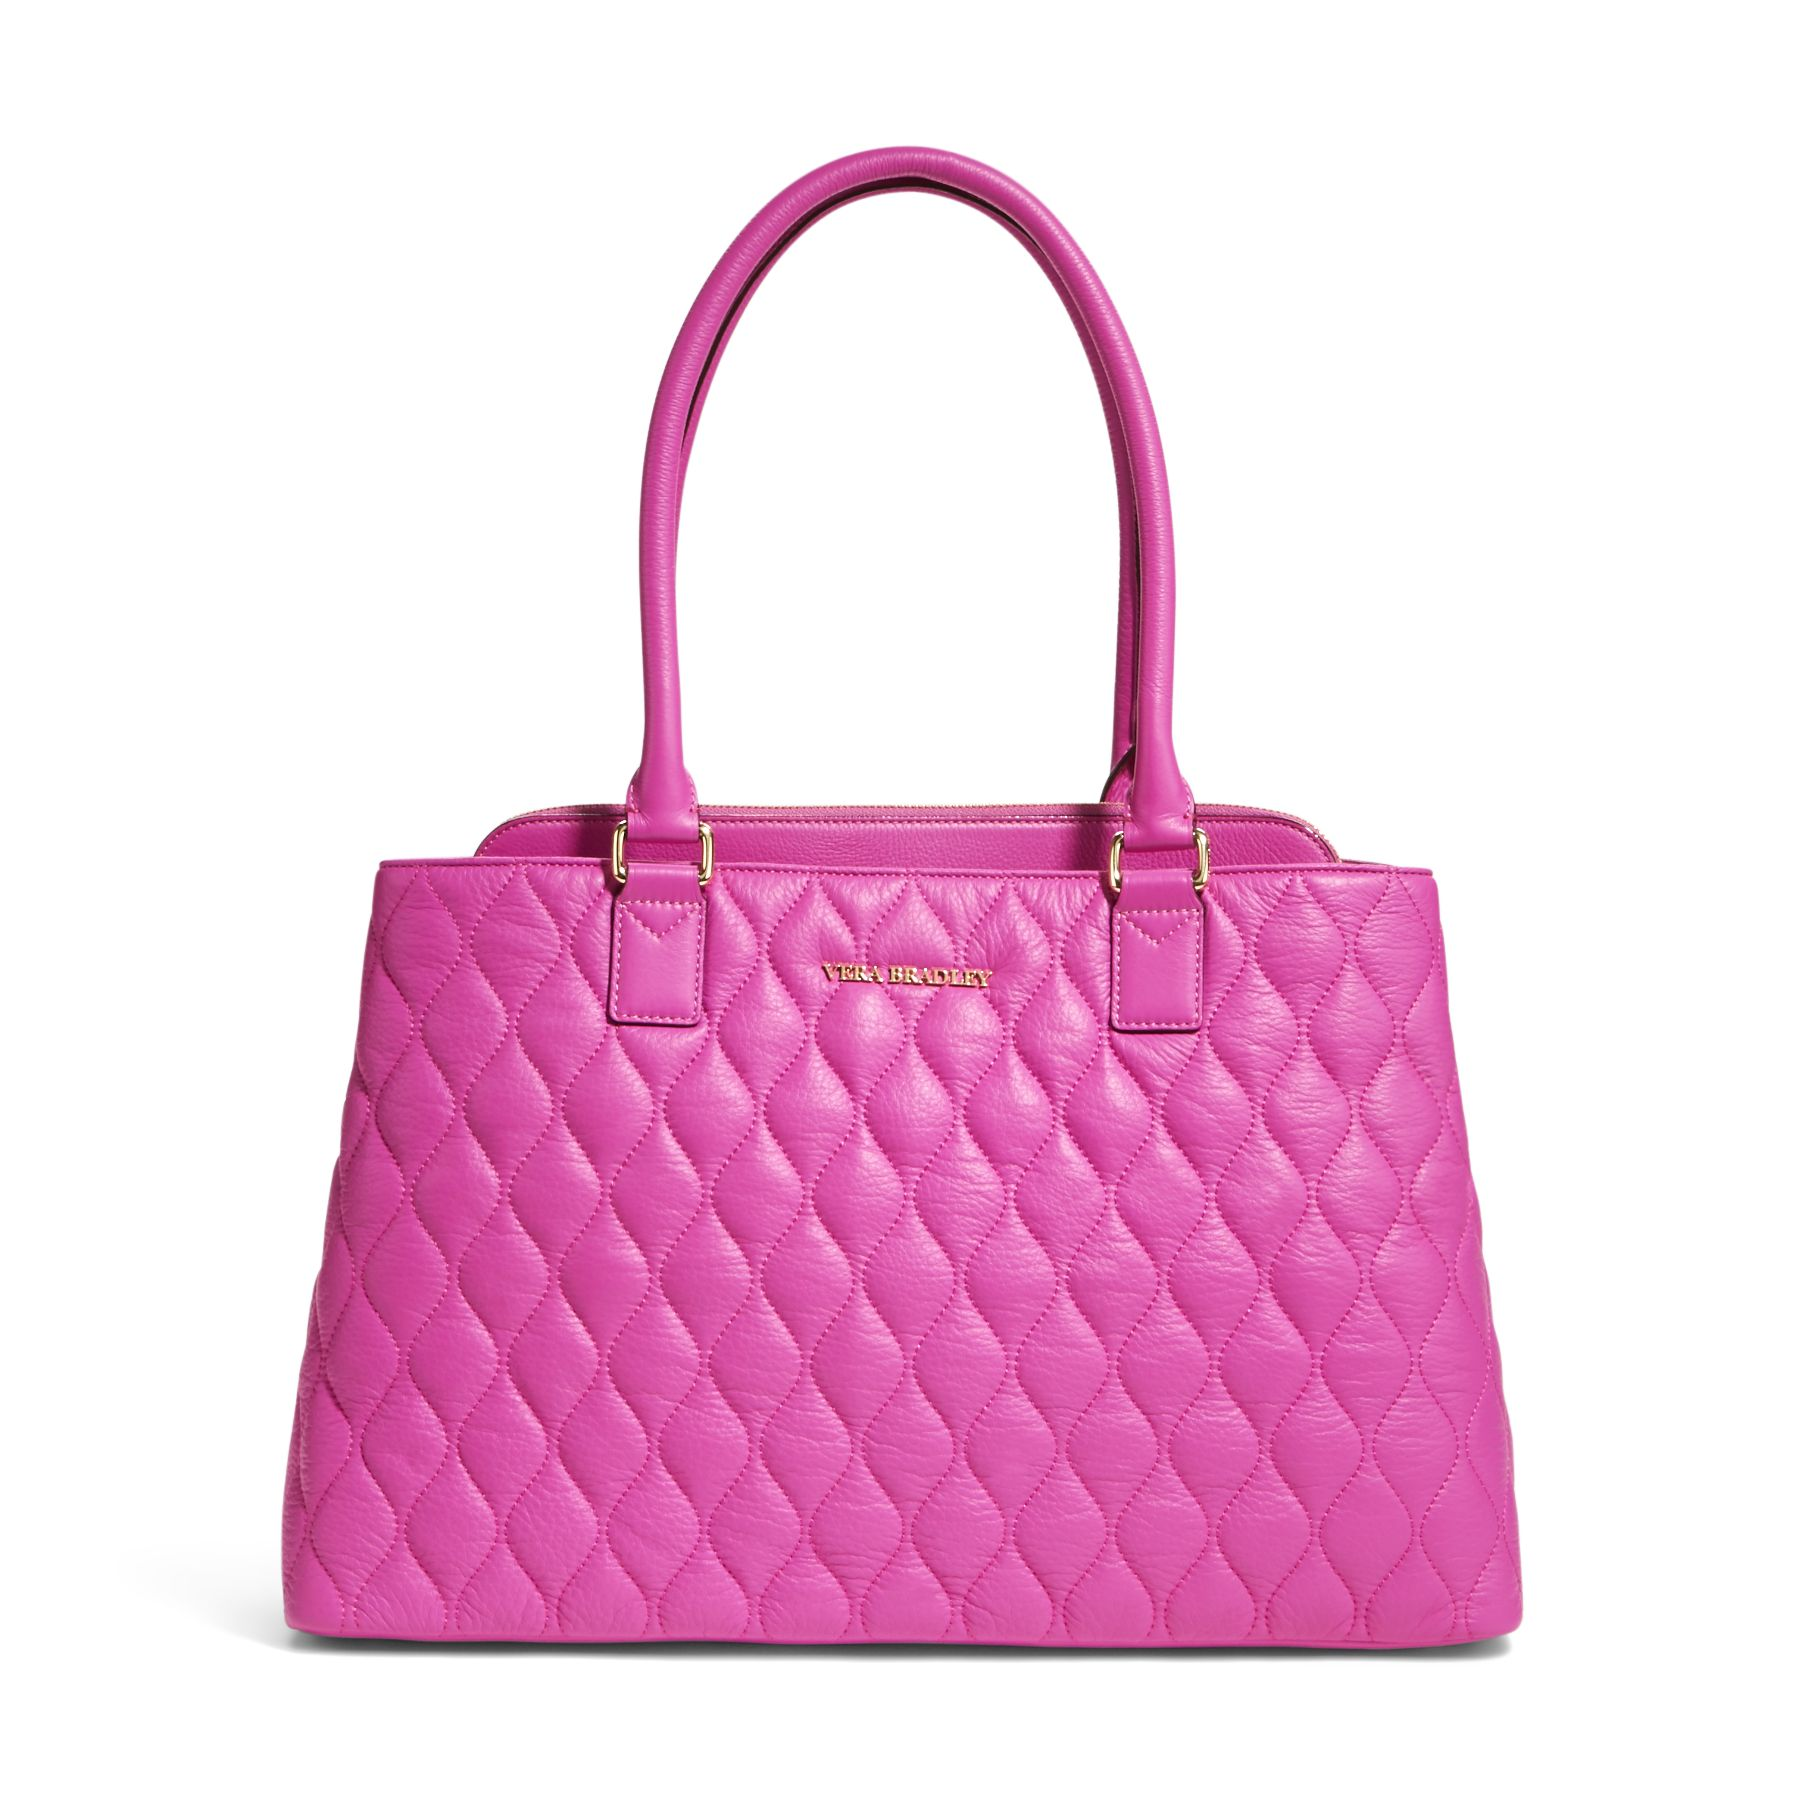 Vera Bradley Quilted Leather Emma Tote Bag Ebay